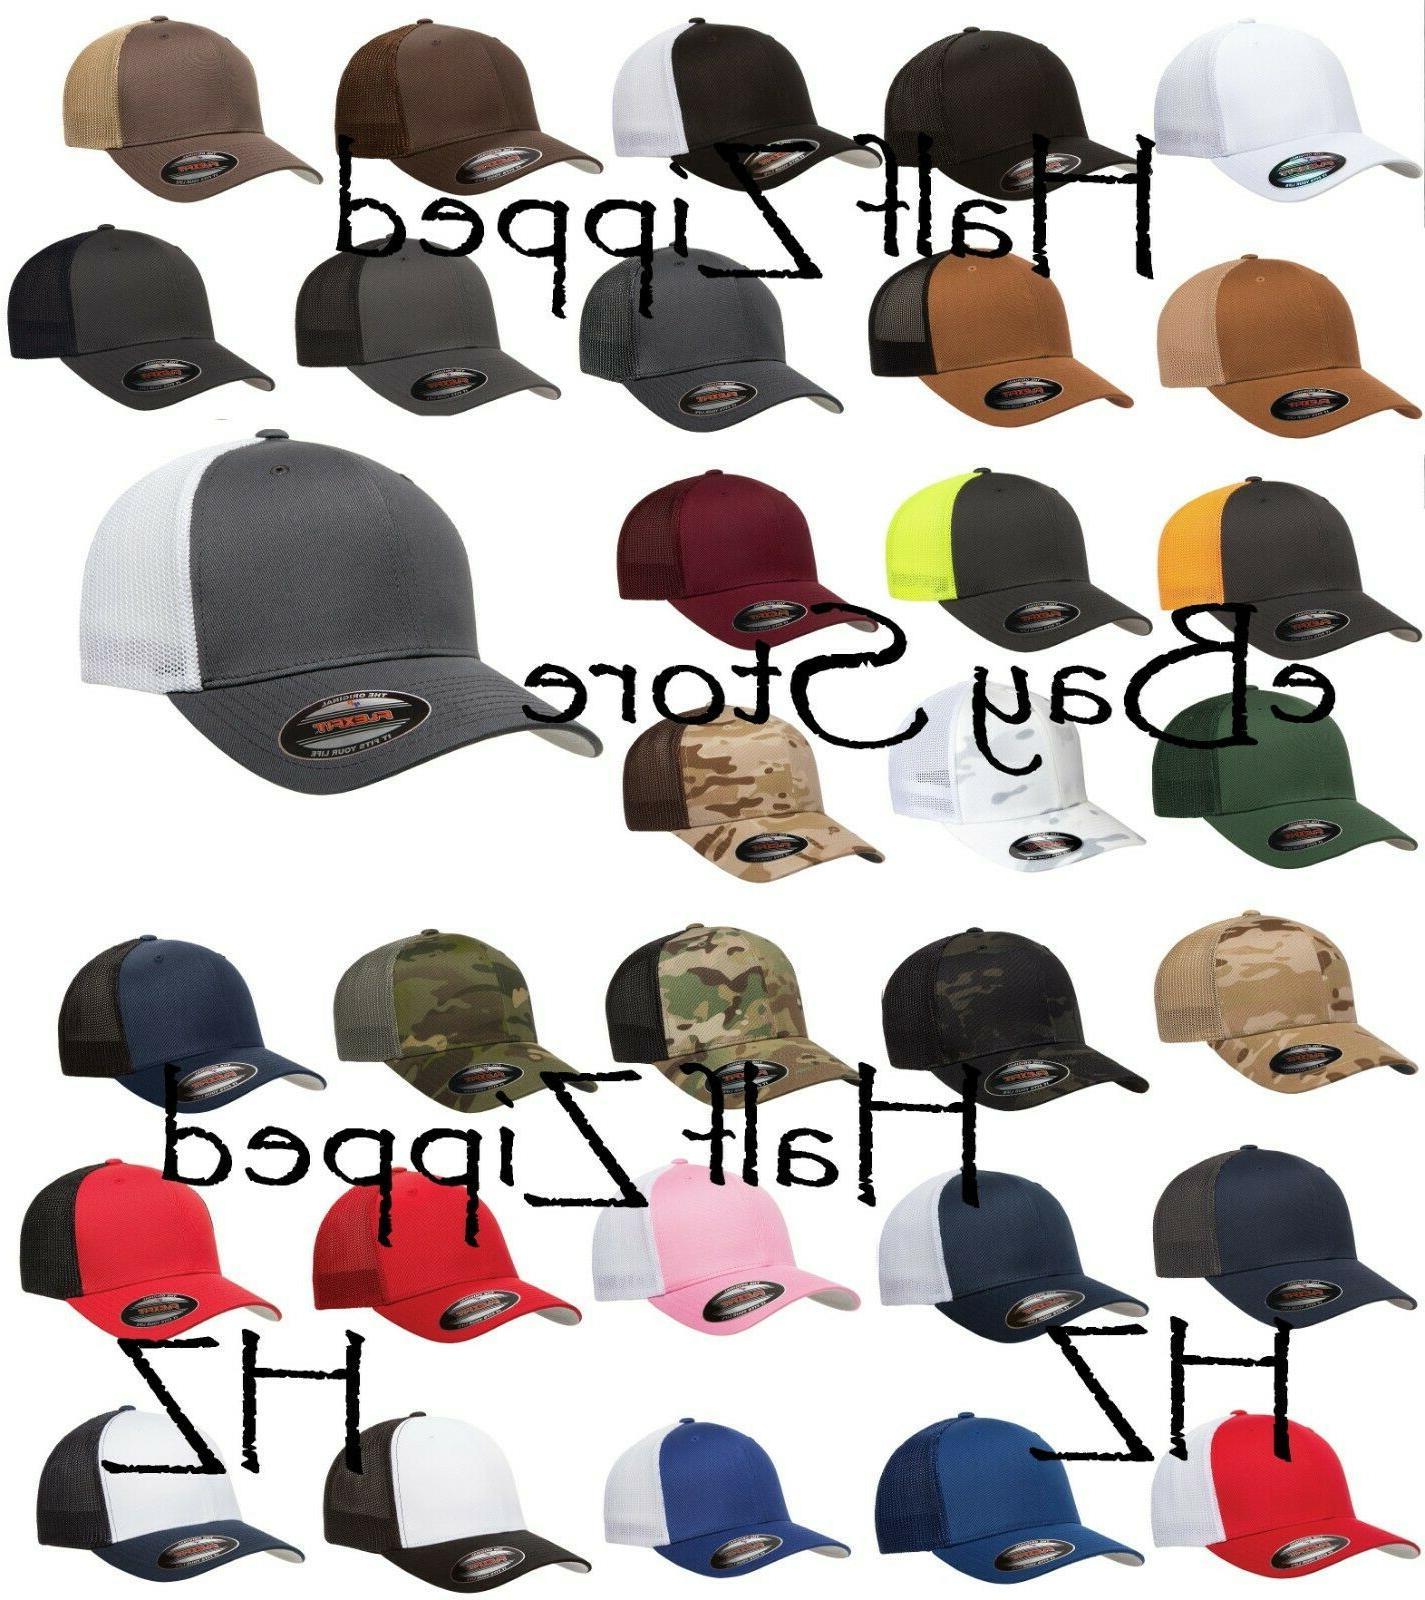 trucker cap fitted mesh hat 6511 baseball